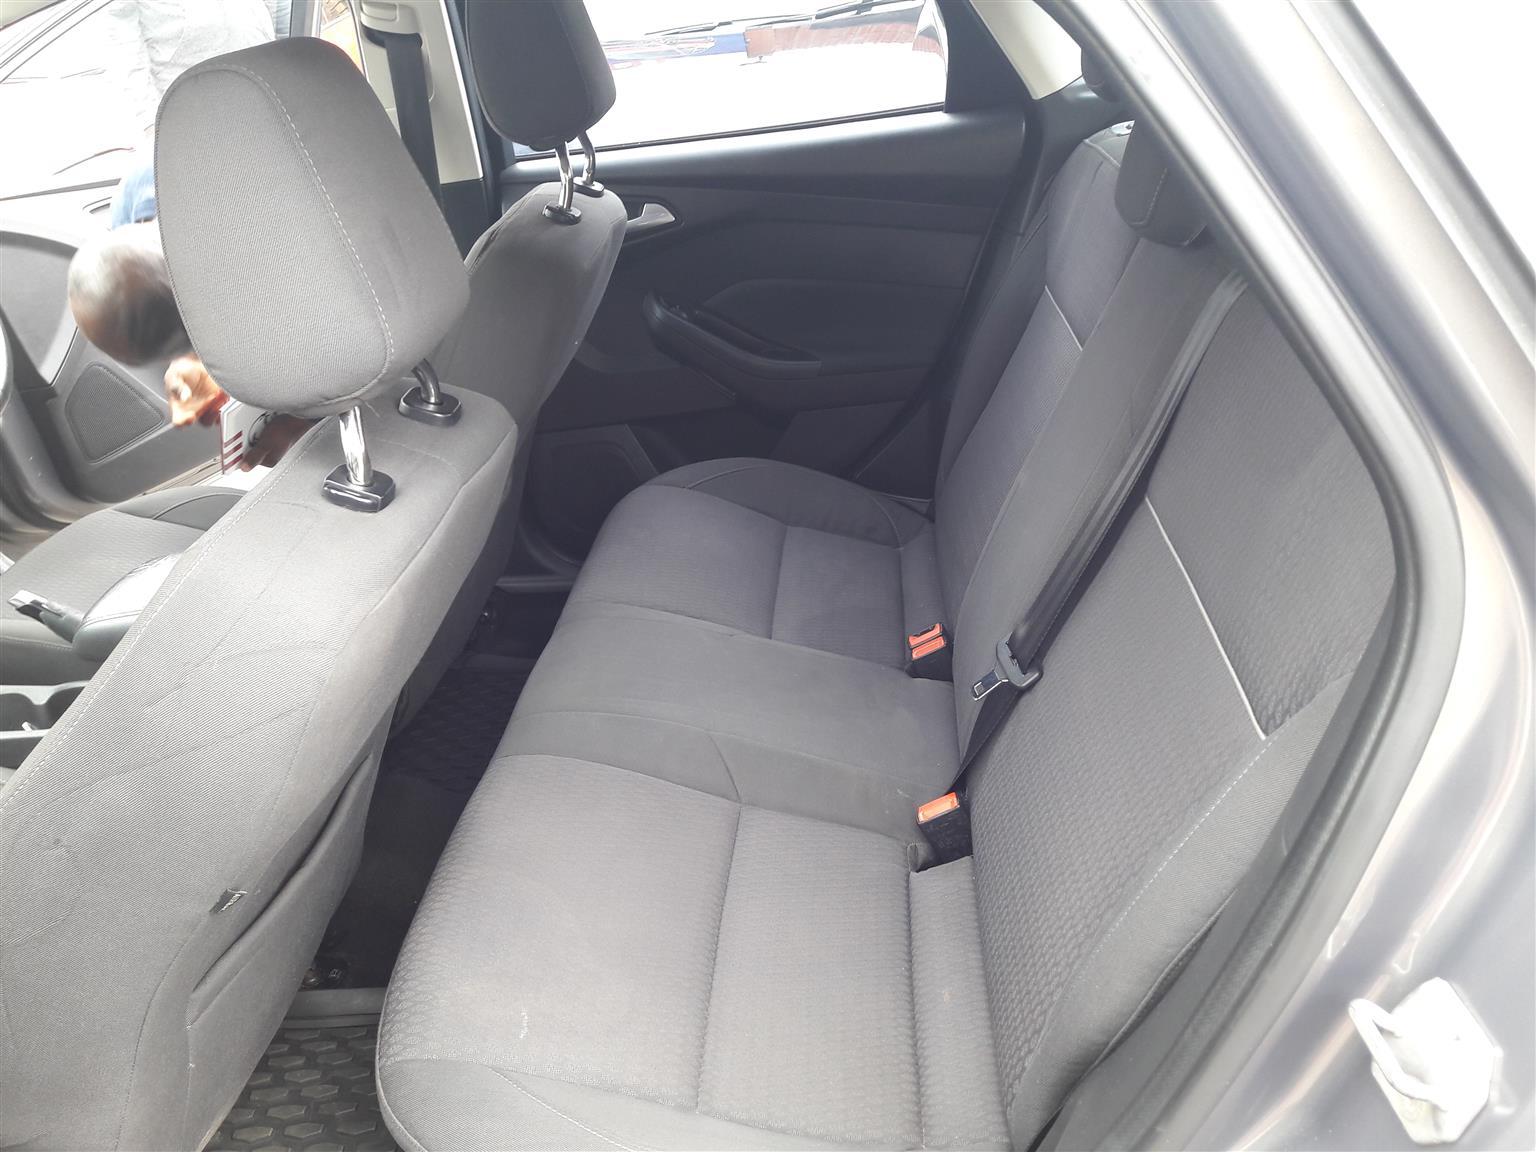 2013 Ford Focus 1.6 5 door Ambiente